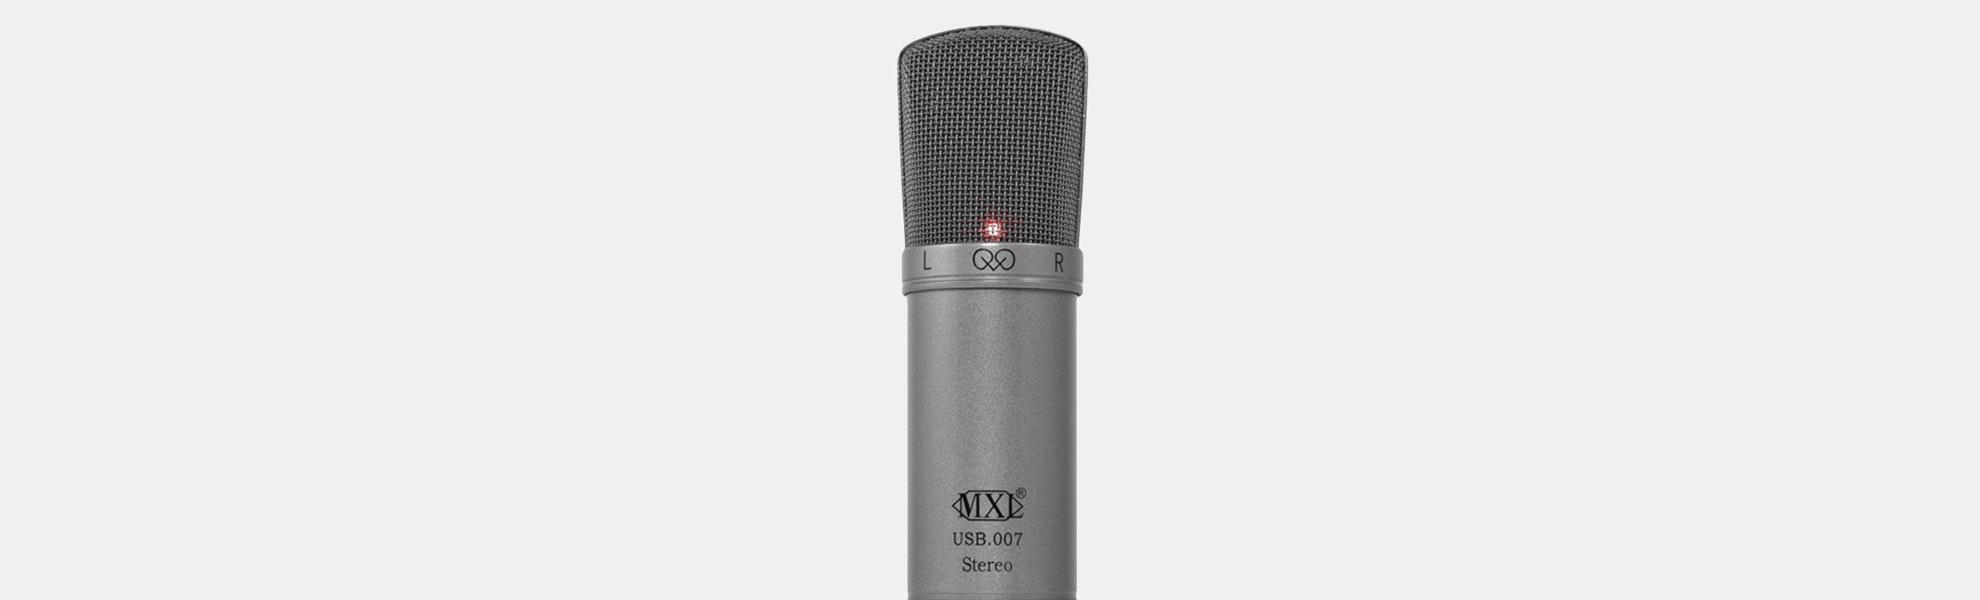 MXL USB .007 Condenser Microphone